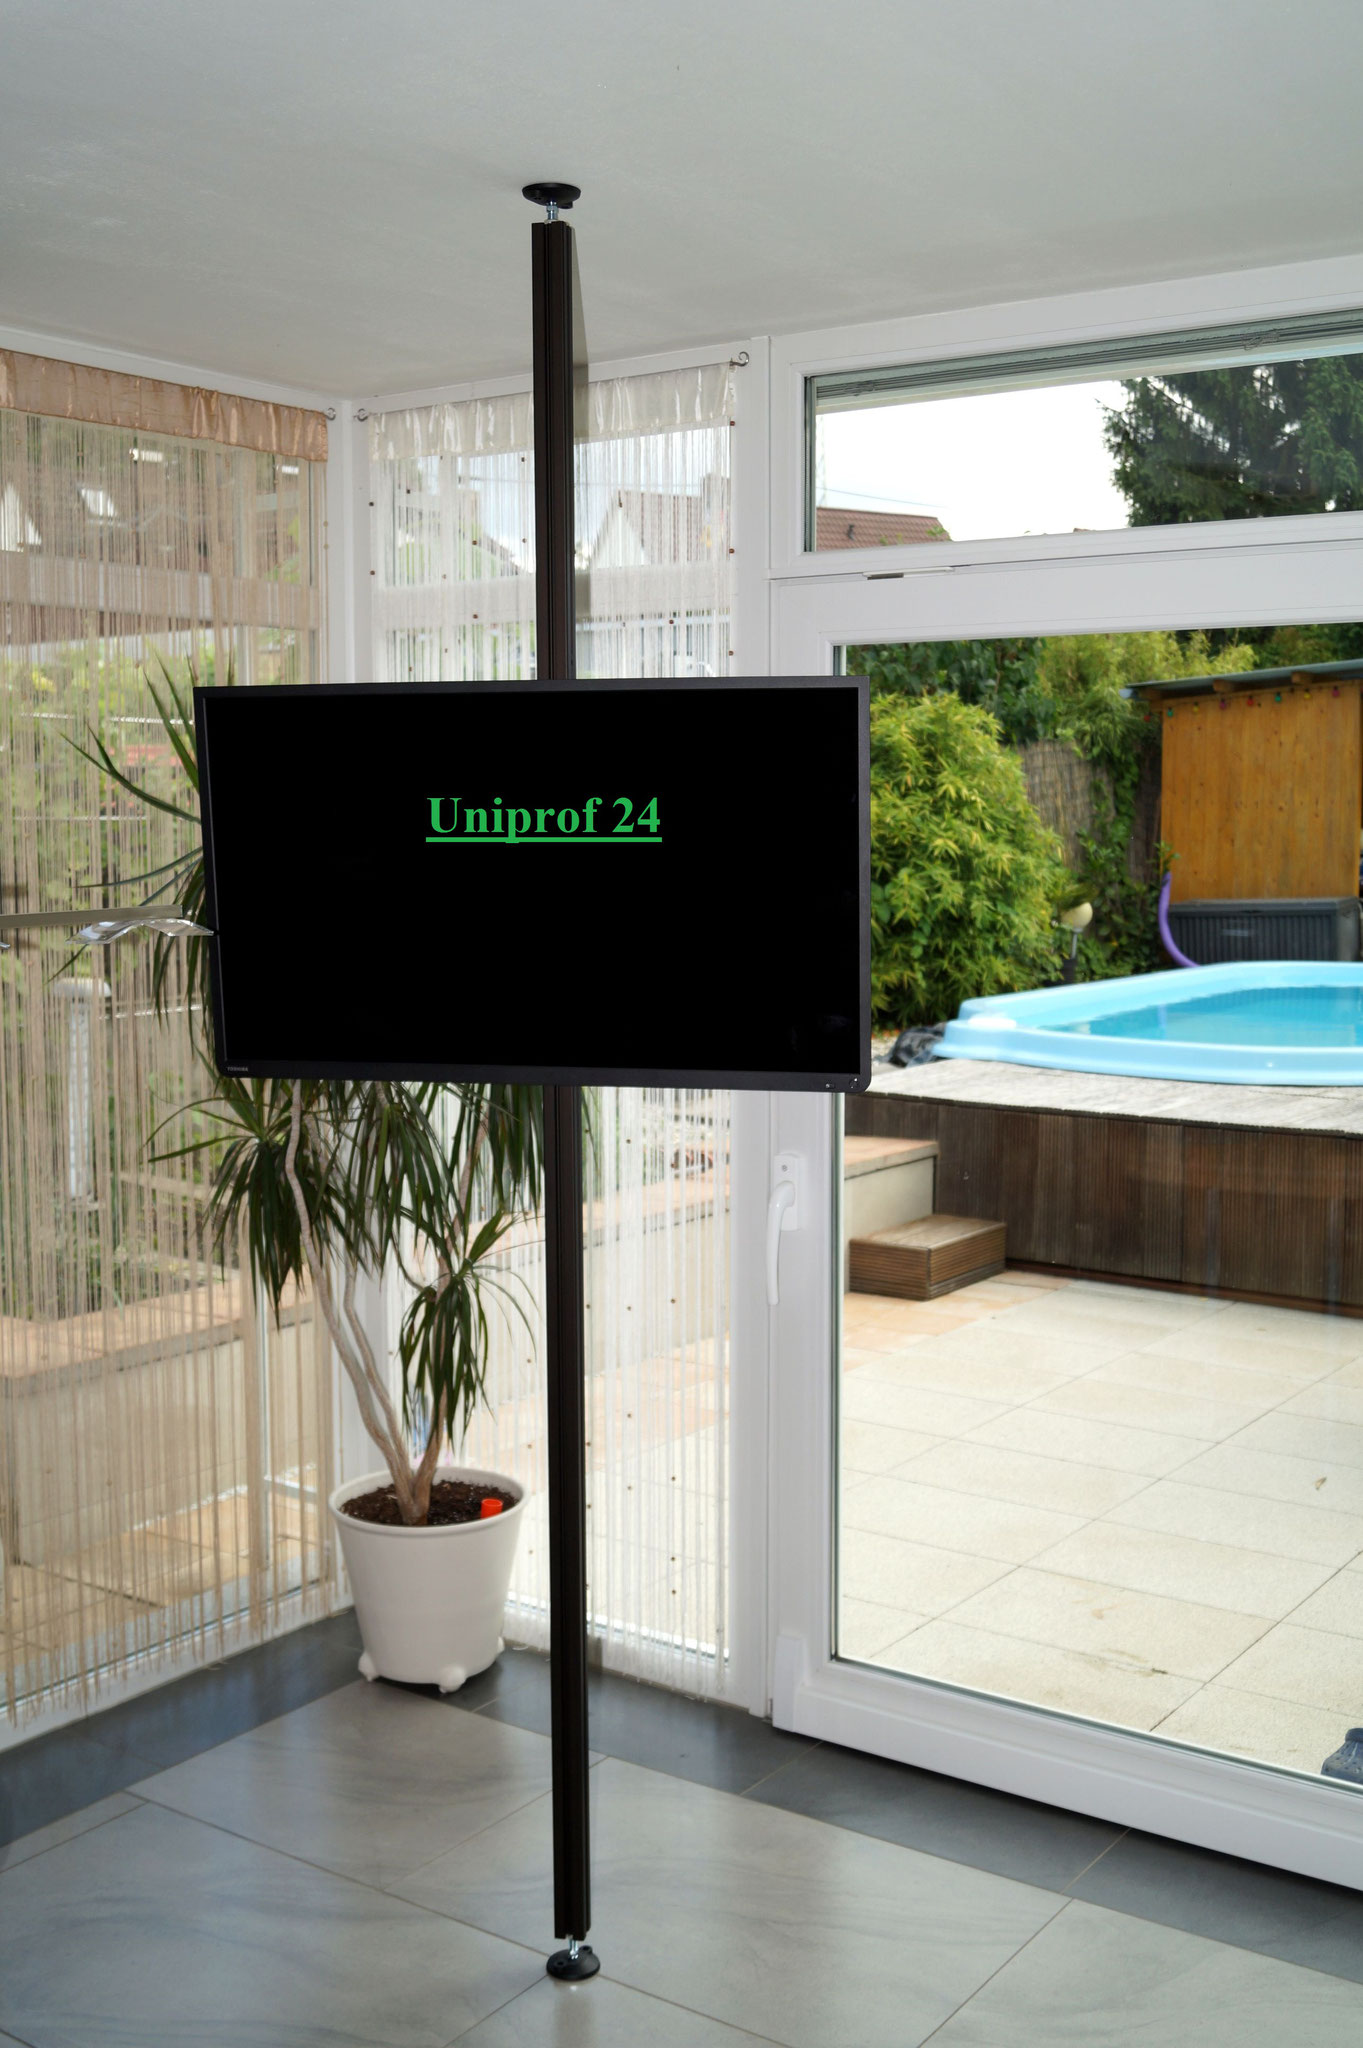 tv halterung decke uni prof 24. Black Bedroom Furniture Sets. Home Design Ideas